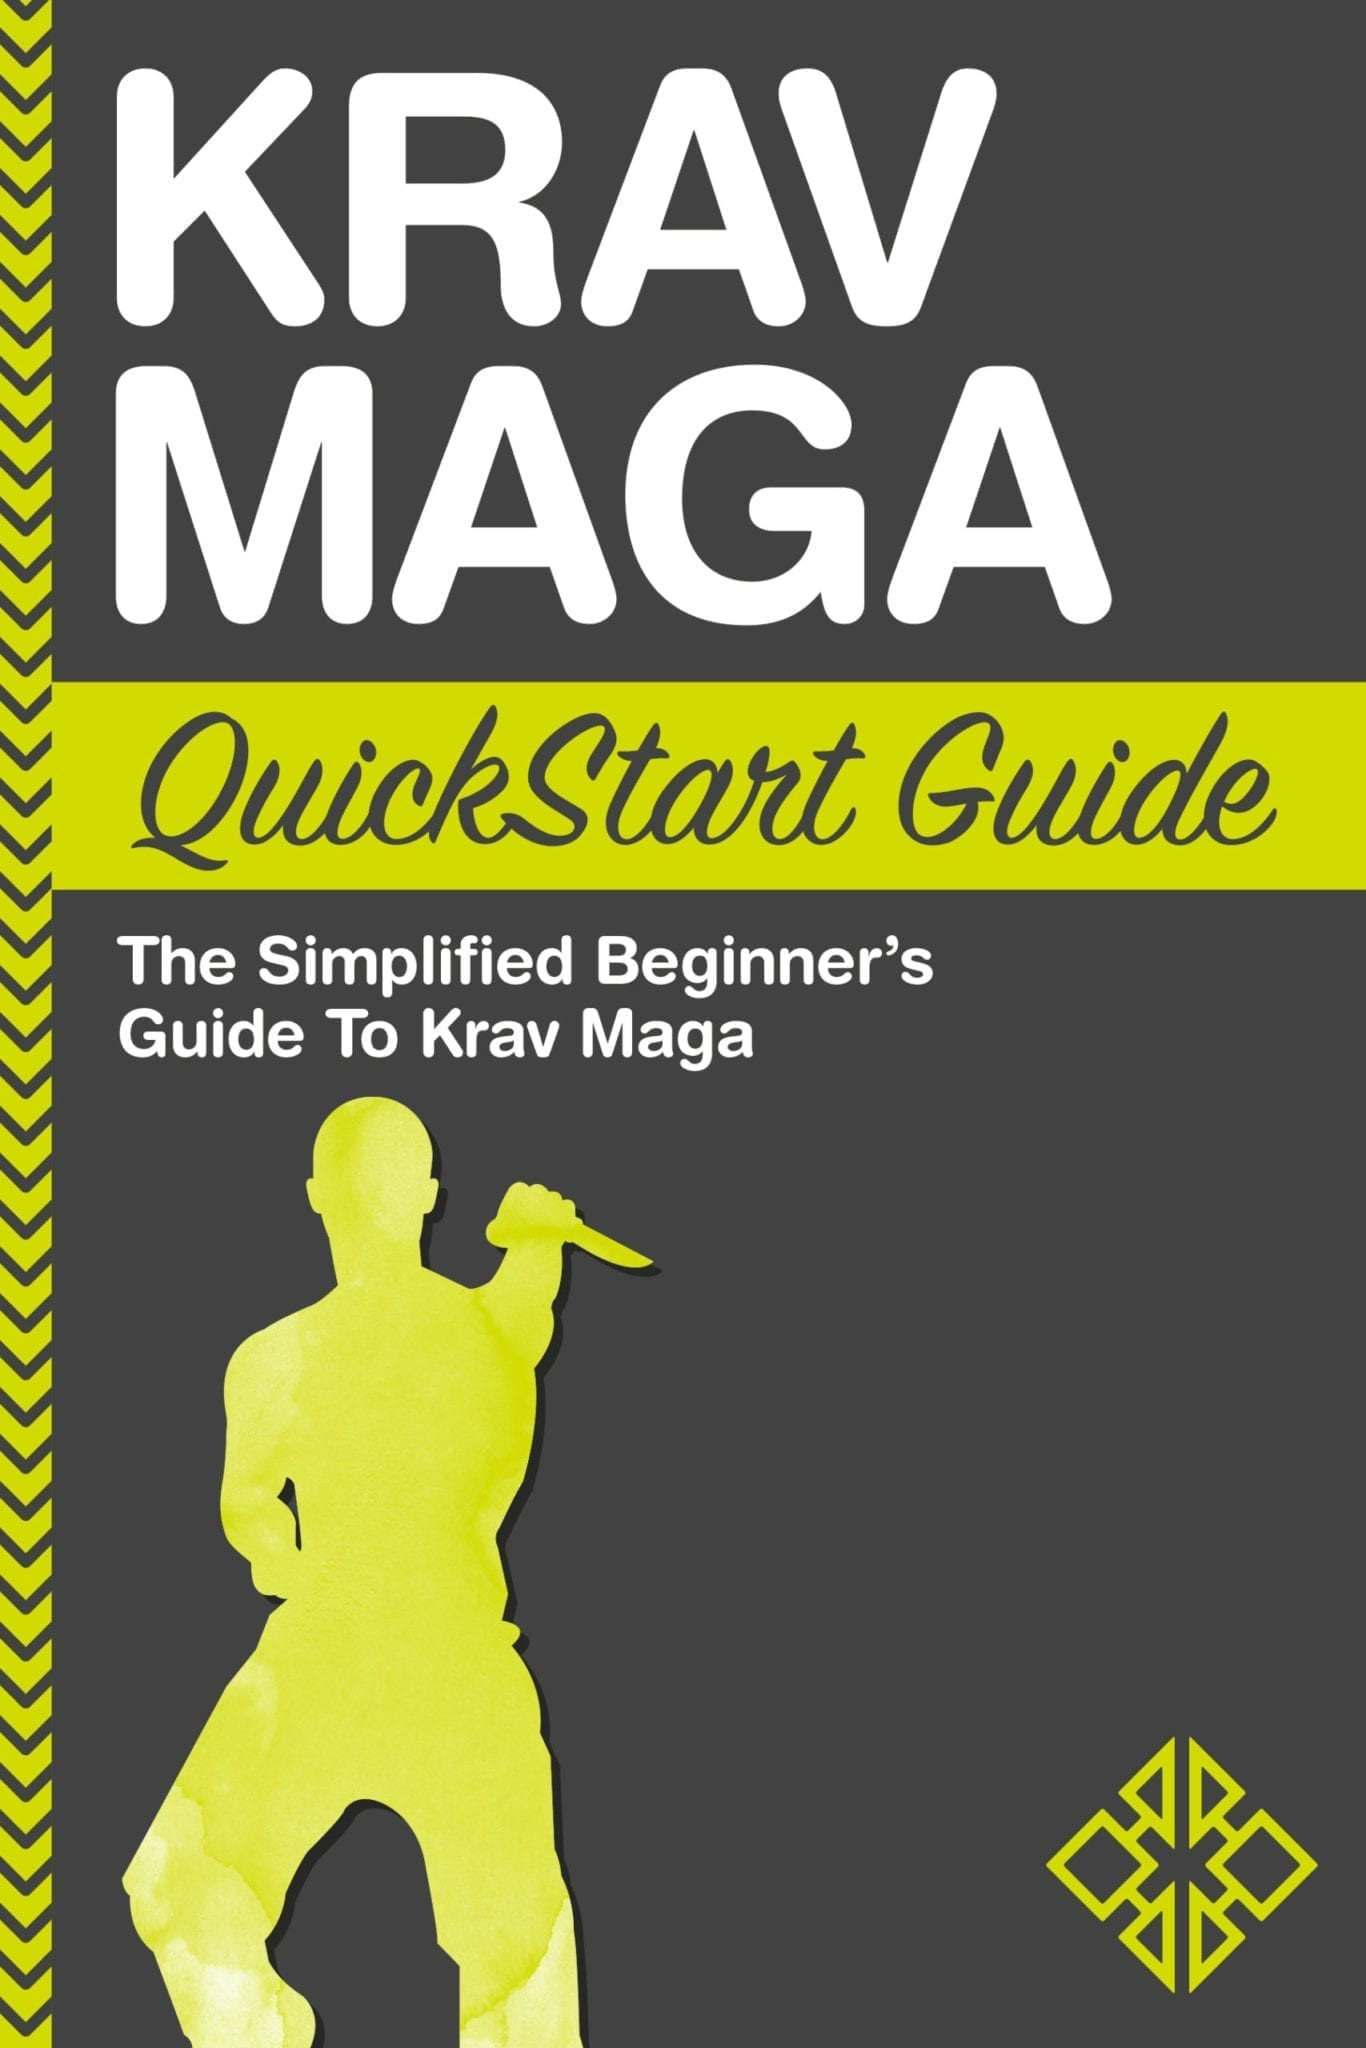 Krav Maga QuickStart Guide - Available now from ClydeBank Media